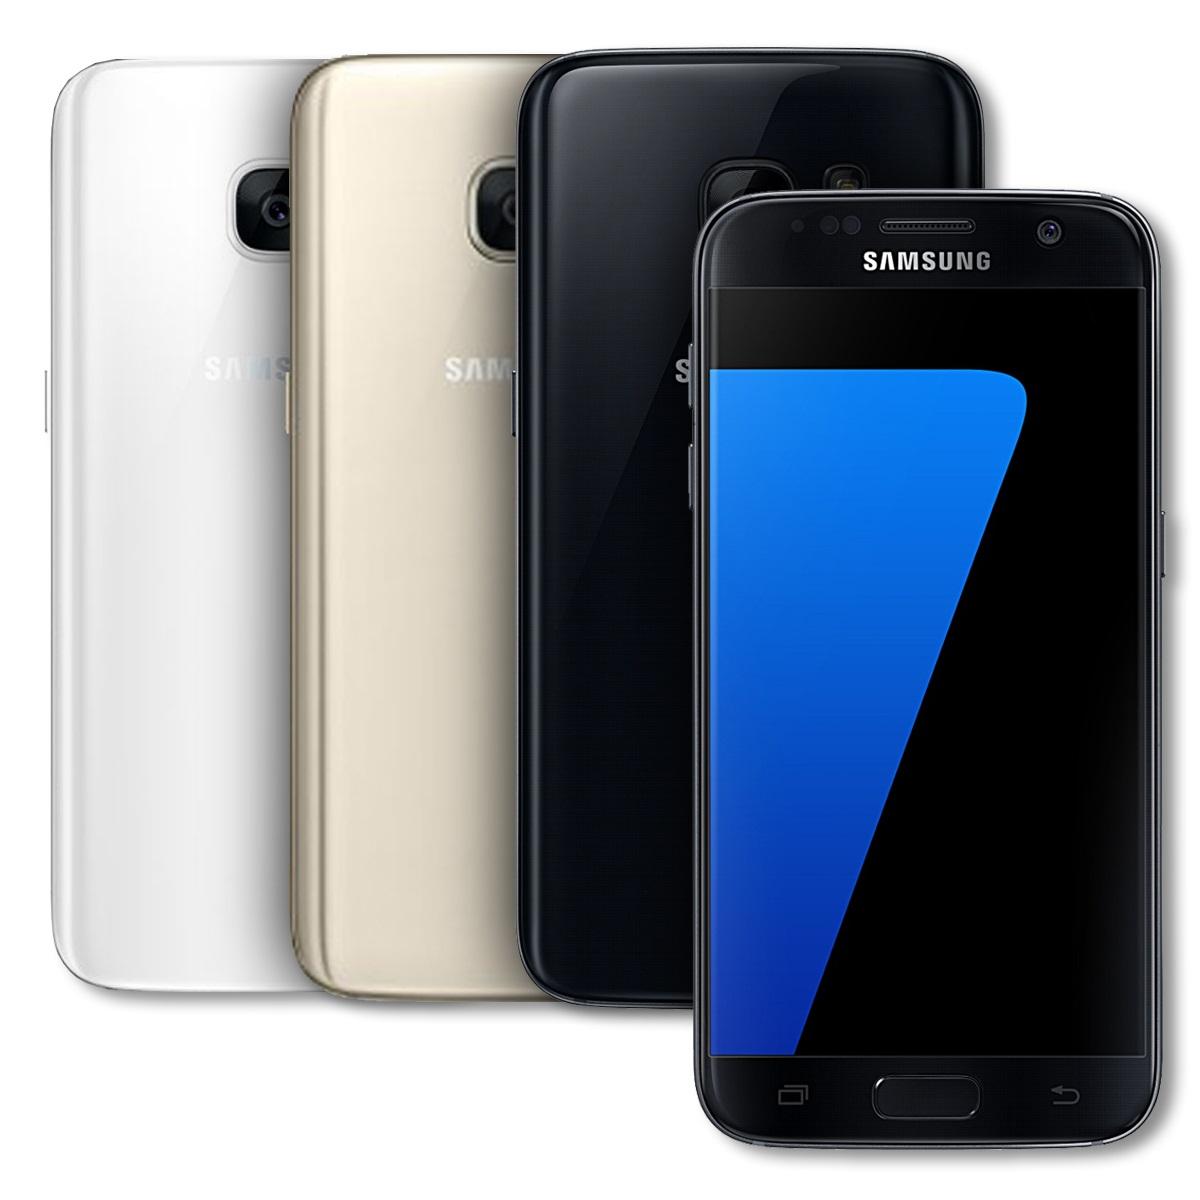 samsung galaxy s7 32gb sm g930a smartphone 4g lte att g930 ebay. Black Bedroom Furniture Sets. Home Design Ideas